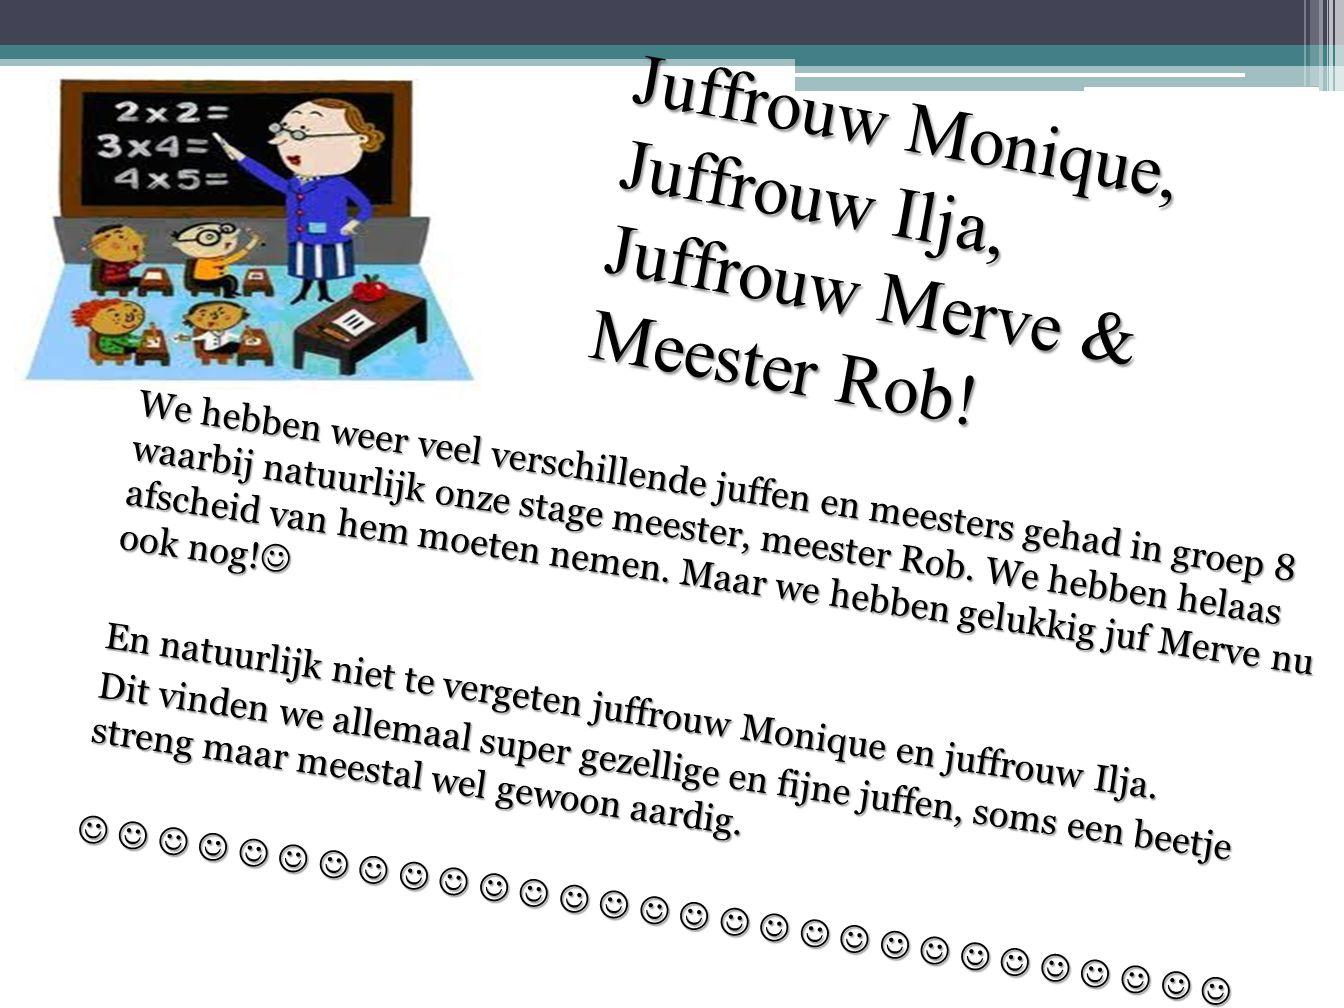 Juffrouw Monique, Juffrouw Ilja, Juffrouw Merve & Meester Rob.